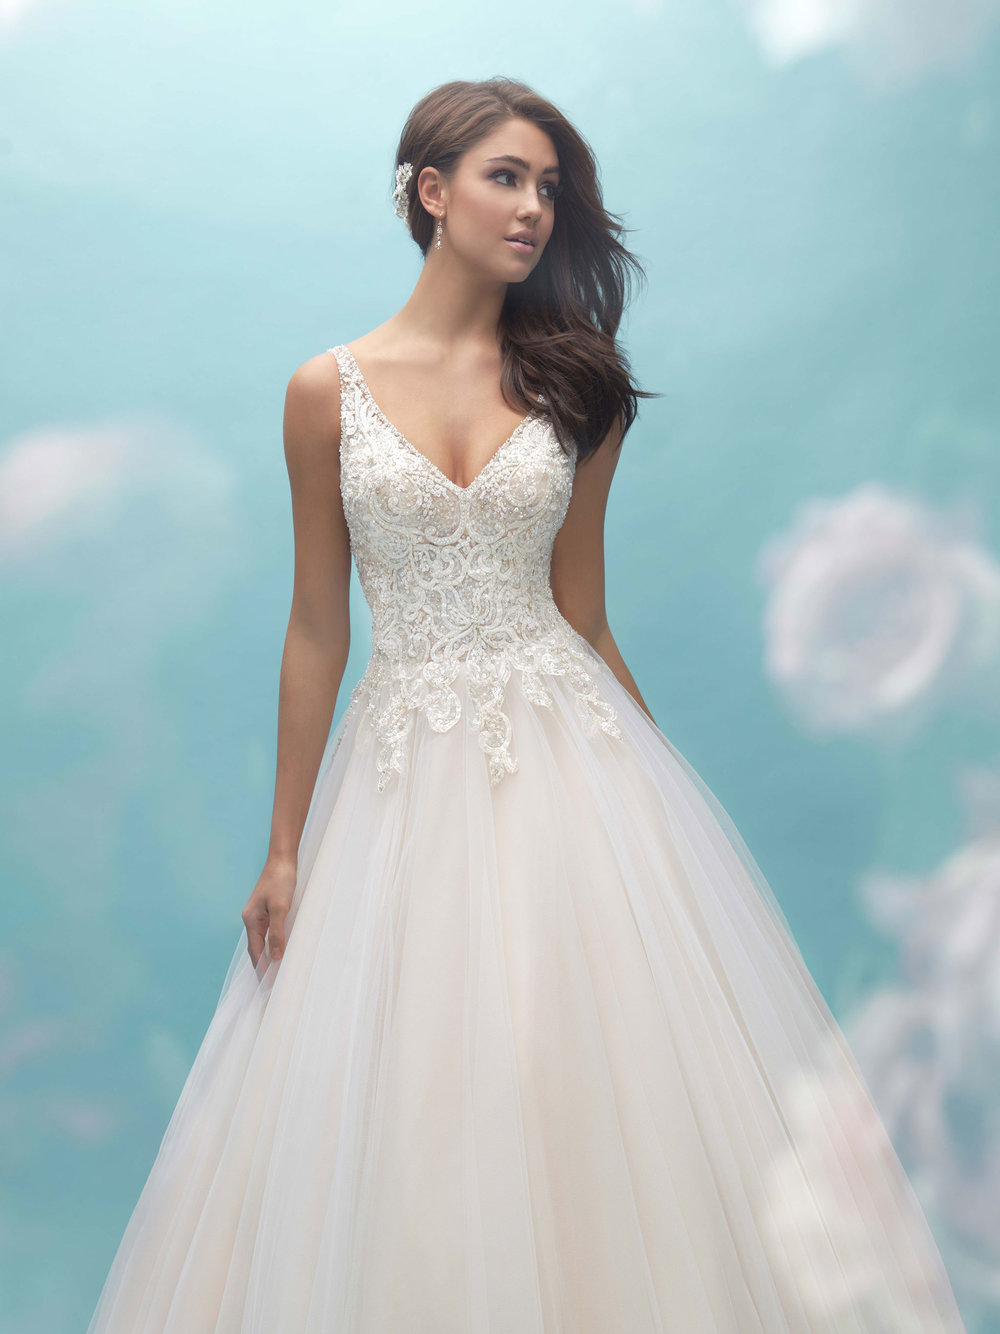 Allure Bridals - $1,000 - $2,000